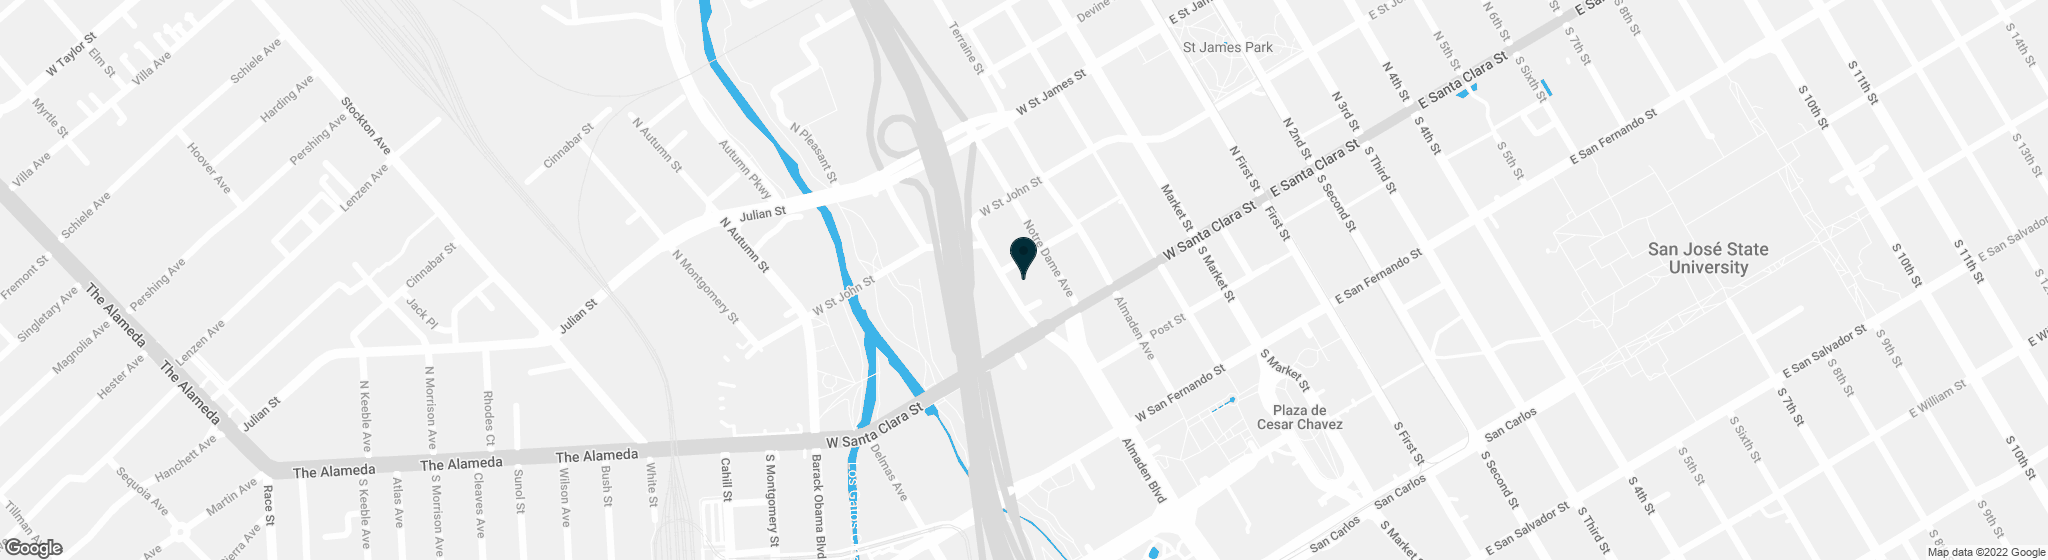 38 Almaden #1800 San Jose CA 95110